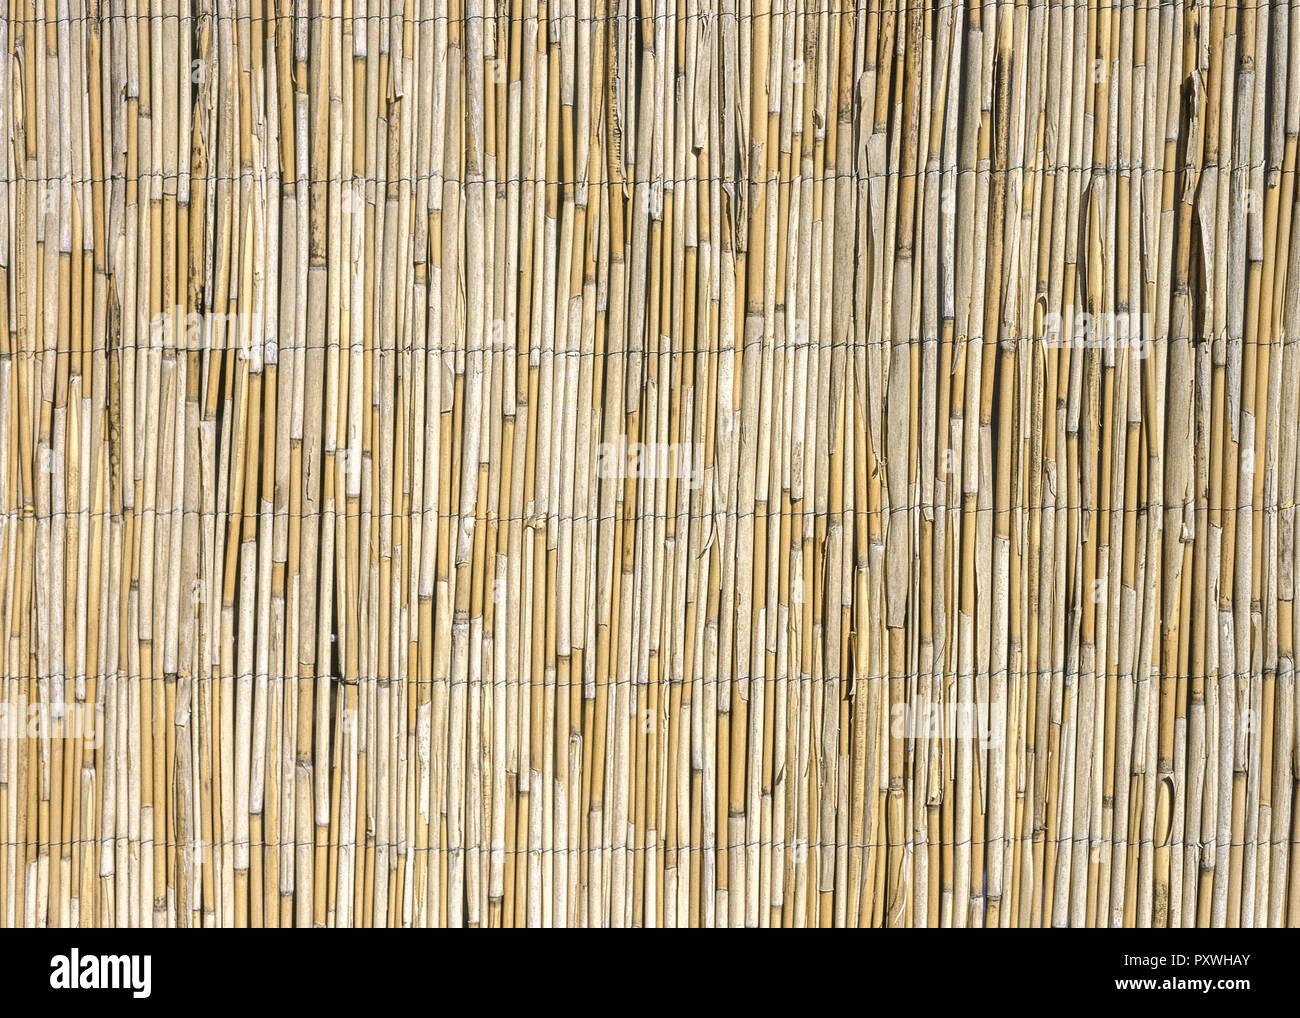 Sichtschutzzaun Aus Bambus Stock Photo 223067907 Alamy